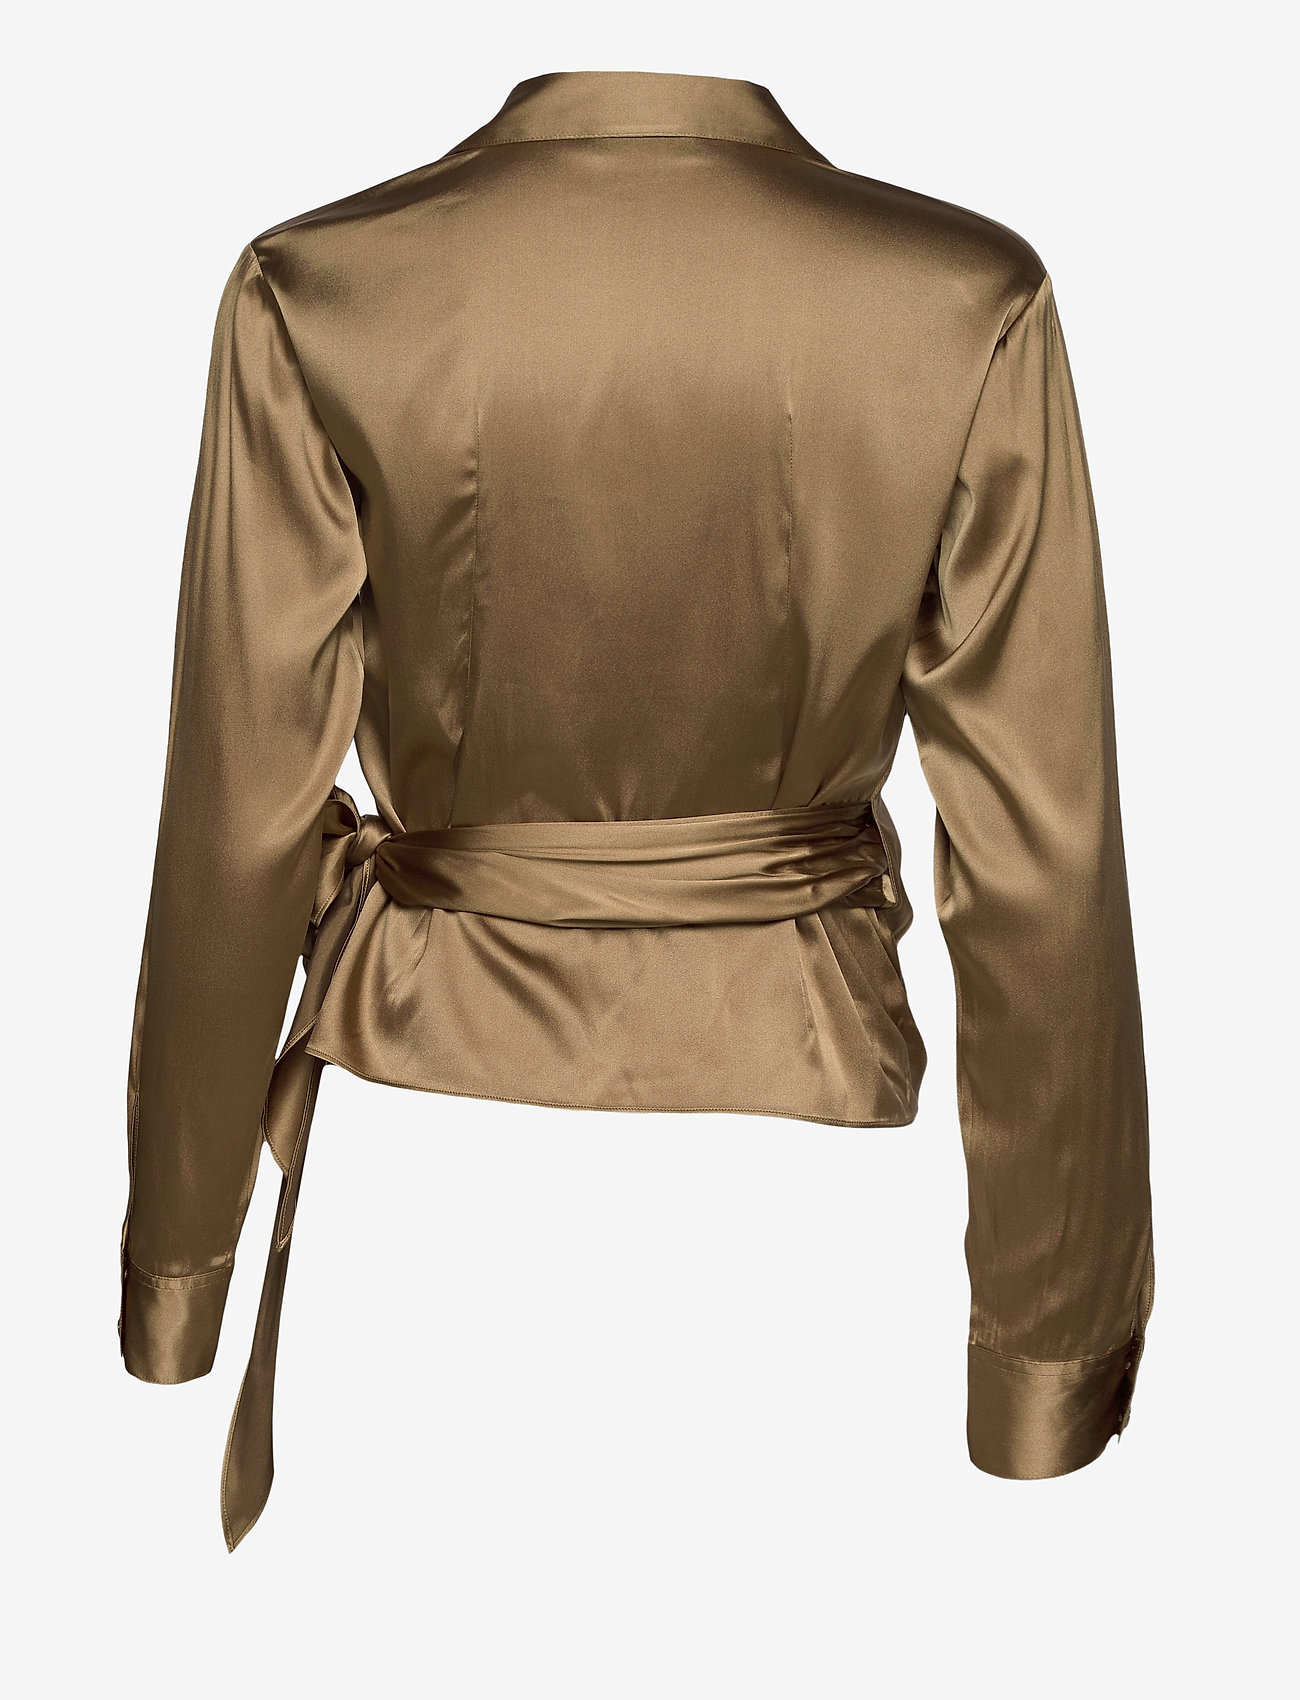 SAND - 3176 - Wrap - blouses met lange mouwen - light camel - 1